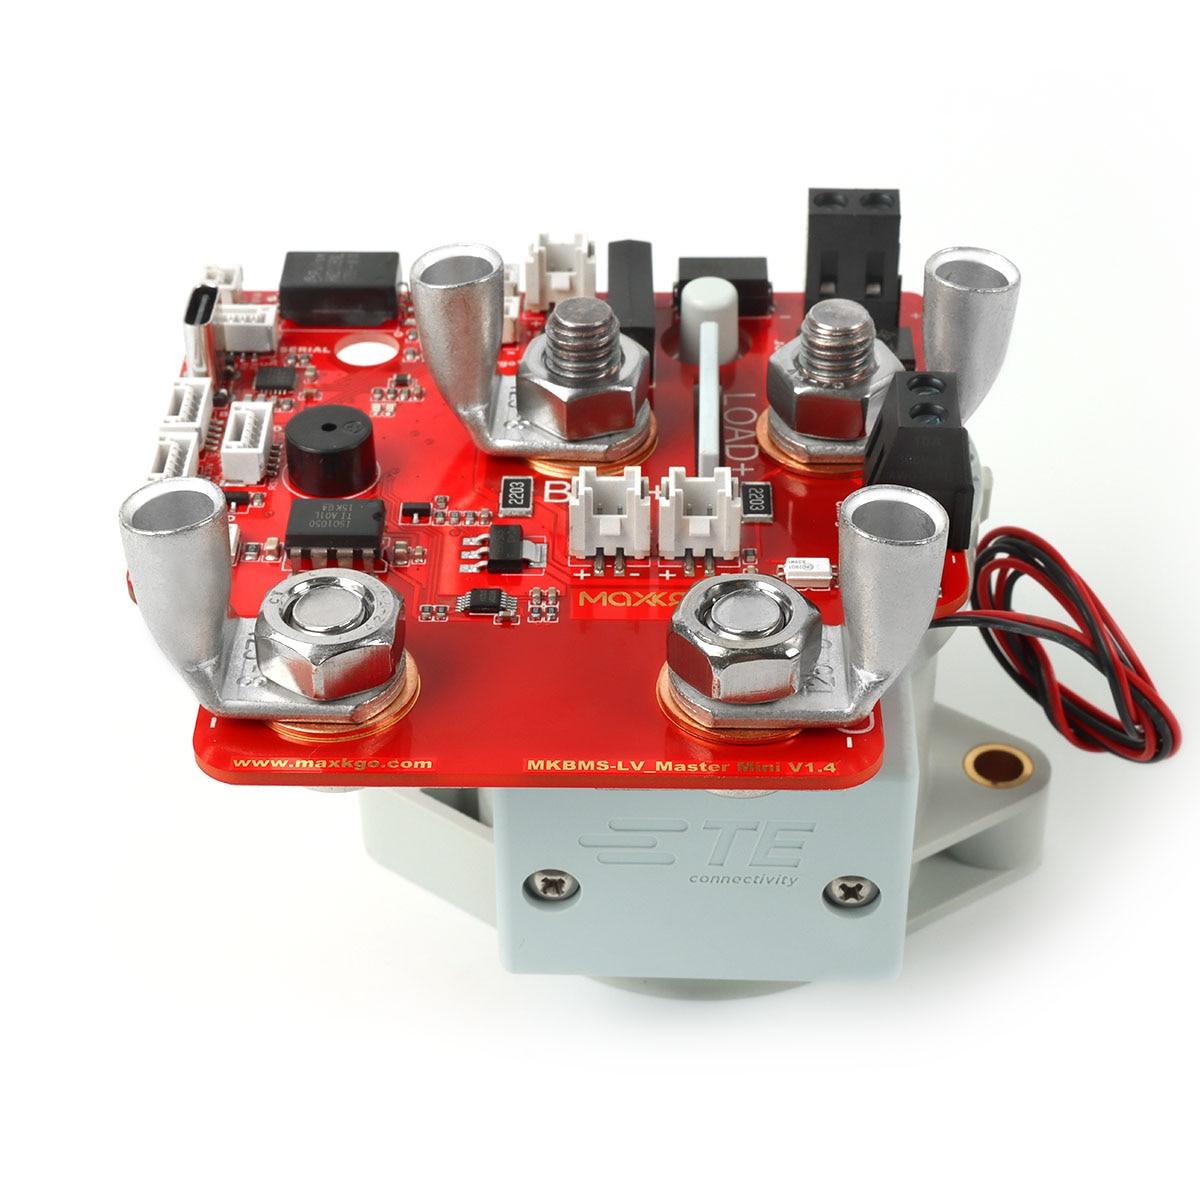 LV BMS Master Board 30V-150V for Li-Ion Li-Polymer Li-Phosphate Battery  Management System 8S / 12S / 18S / 24S /30S / 36S